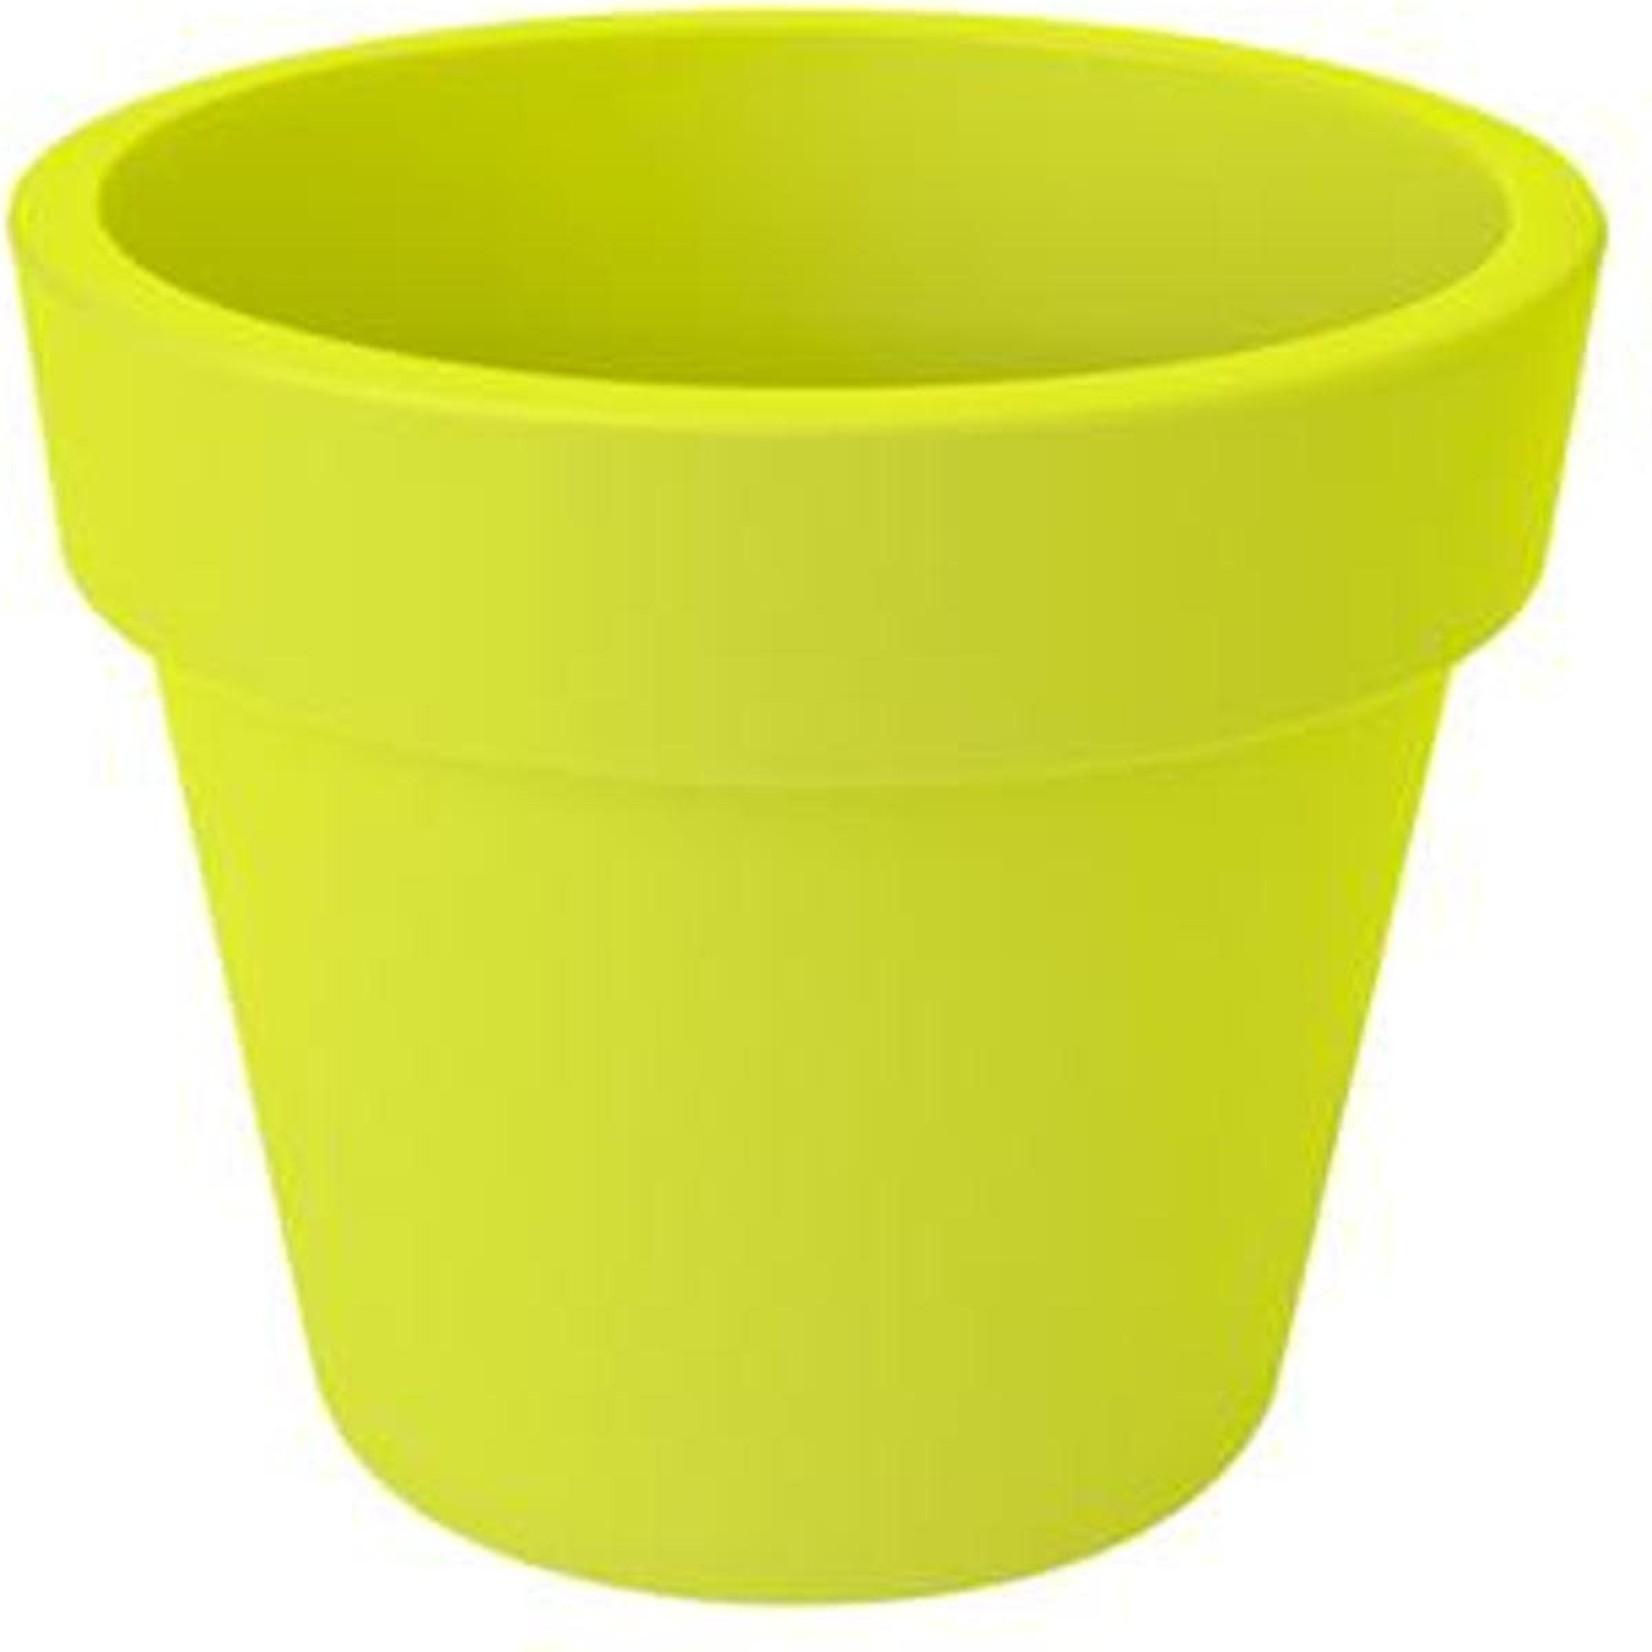 Elho Elho Top Planter 23Cm Lime Green